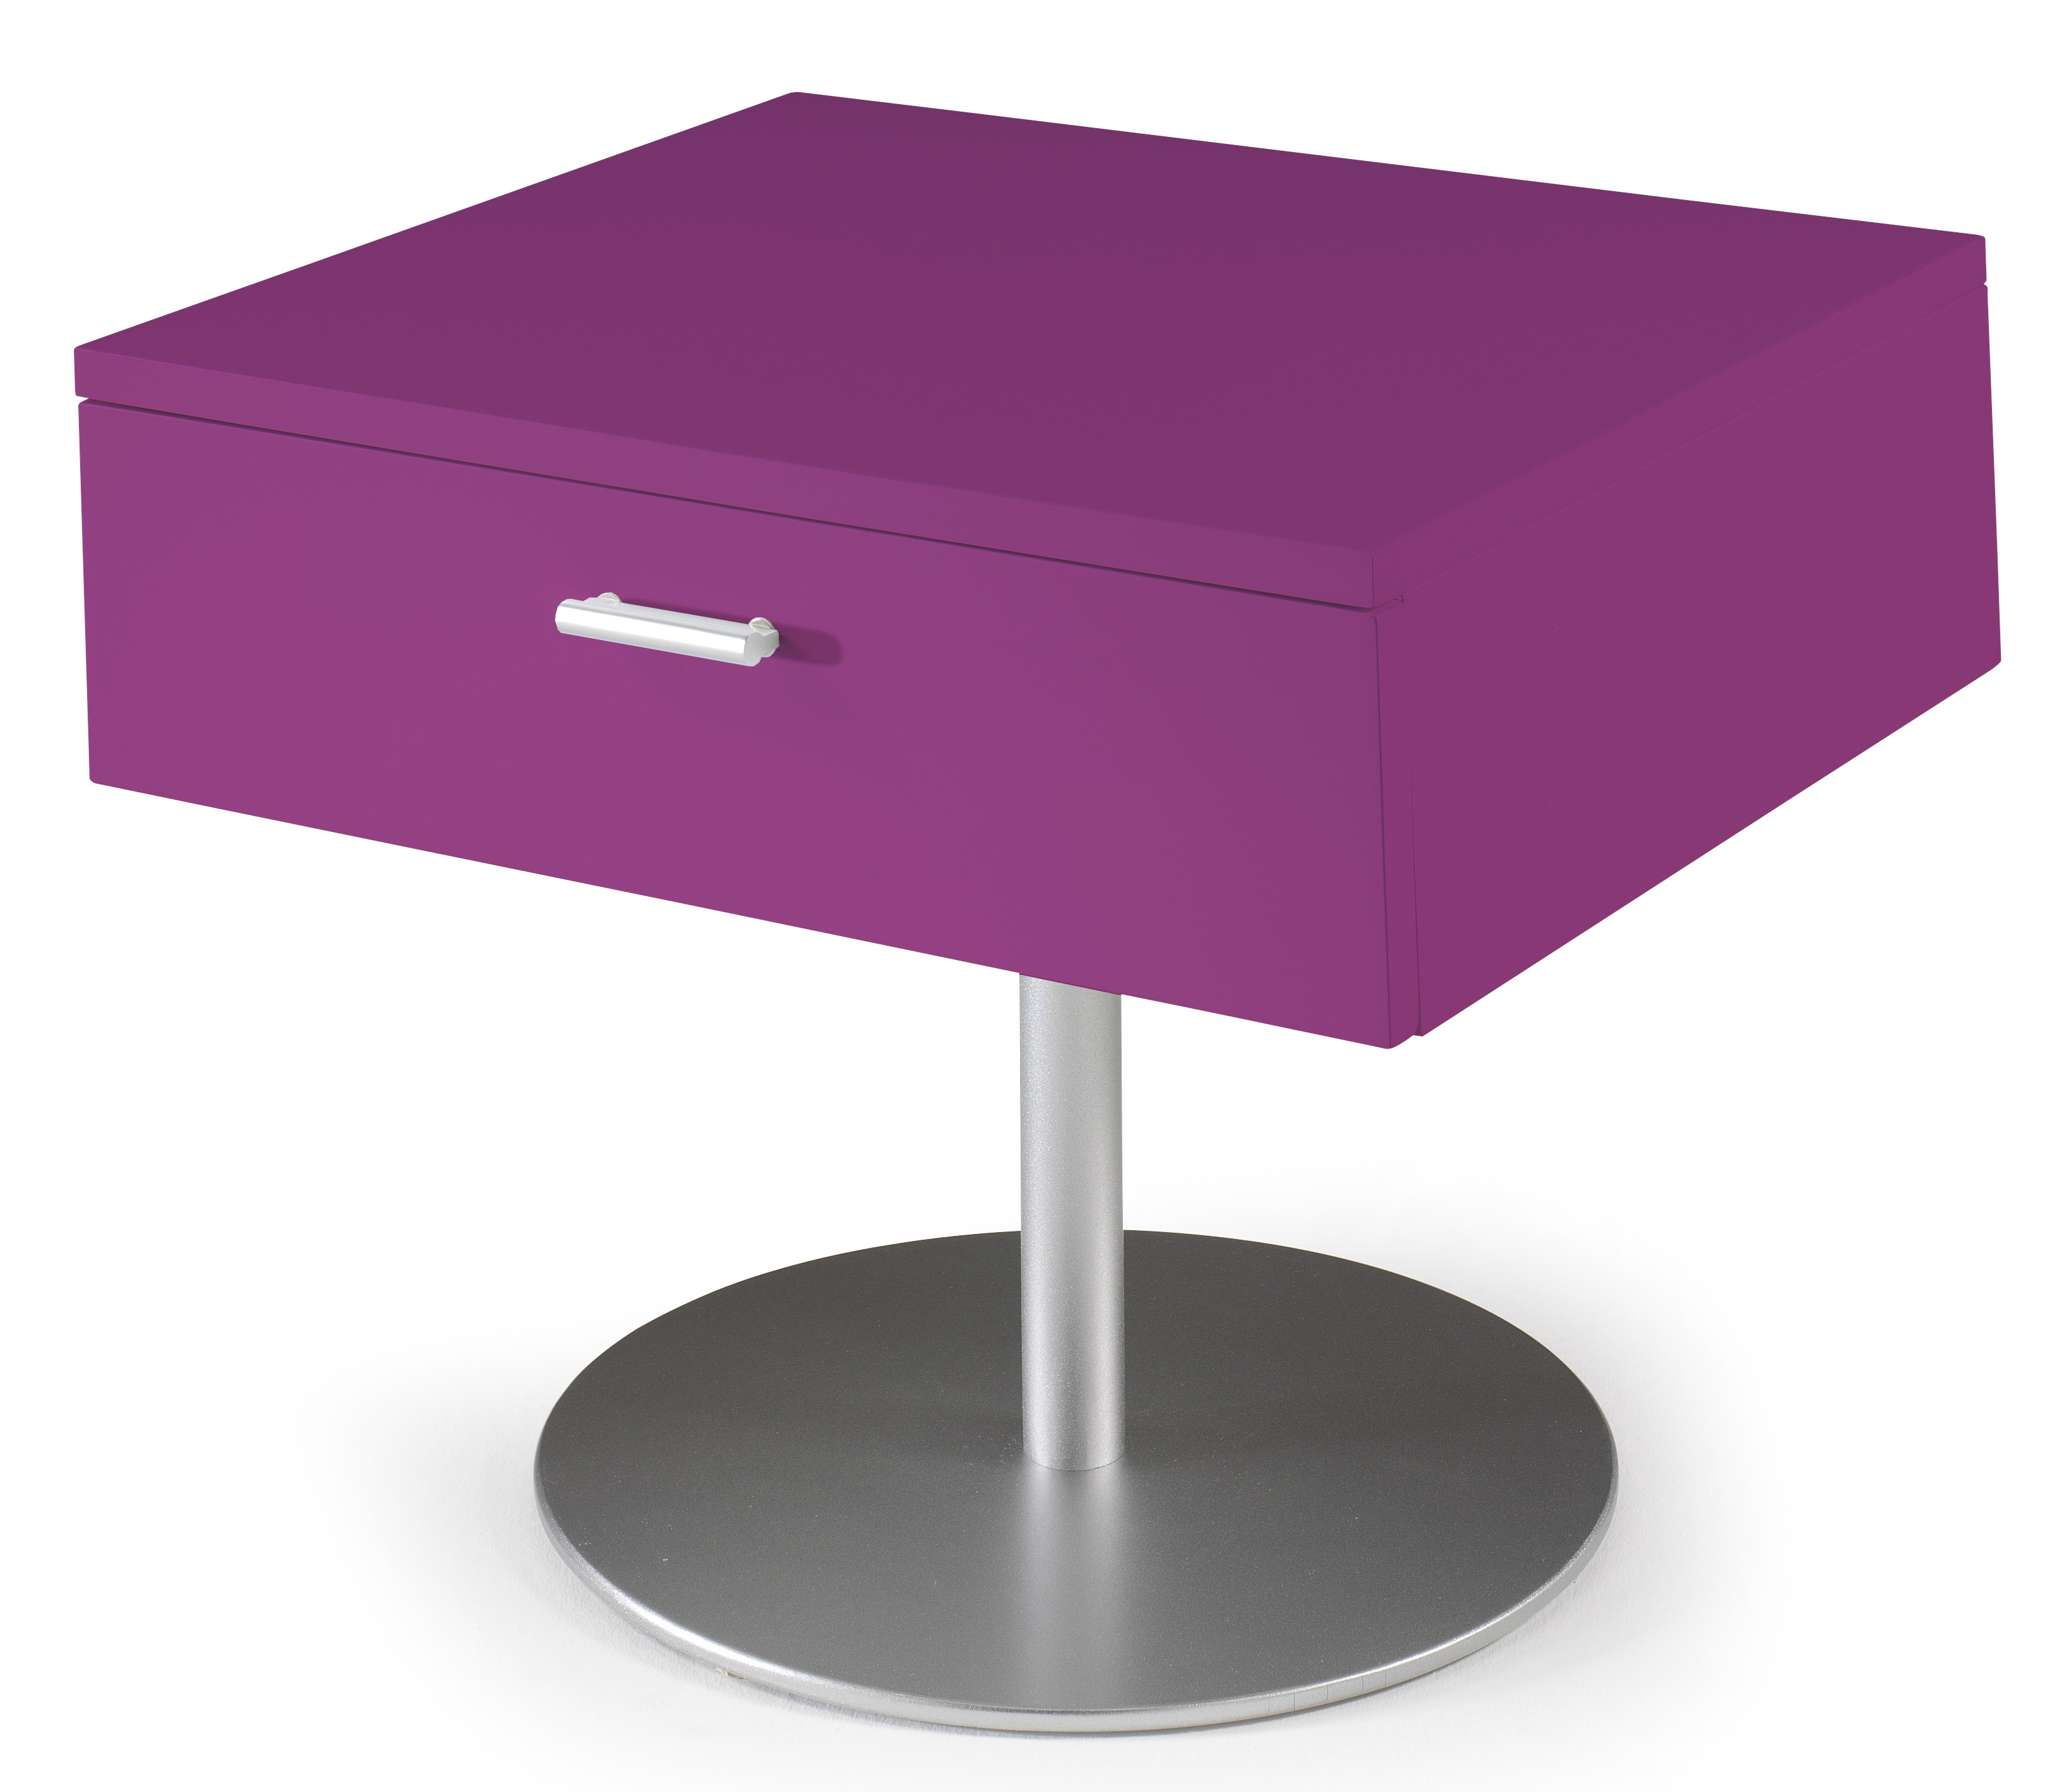 Table de chevet design fuchsia laqu kara for Table th html